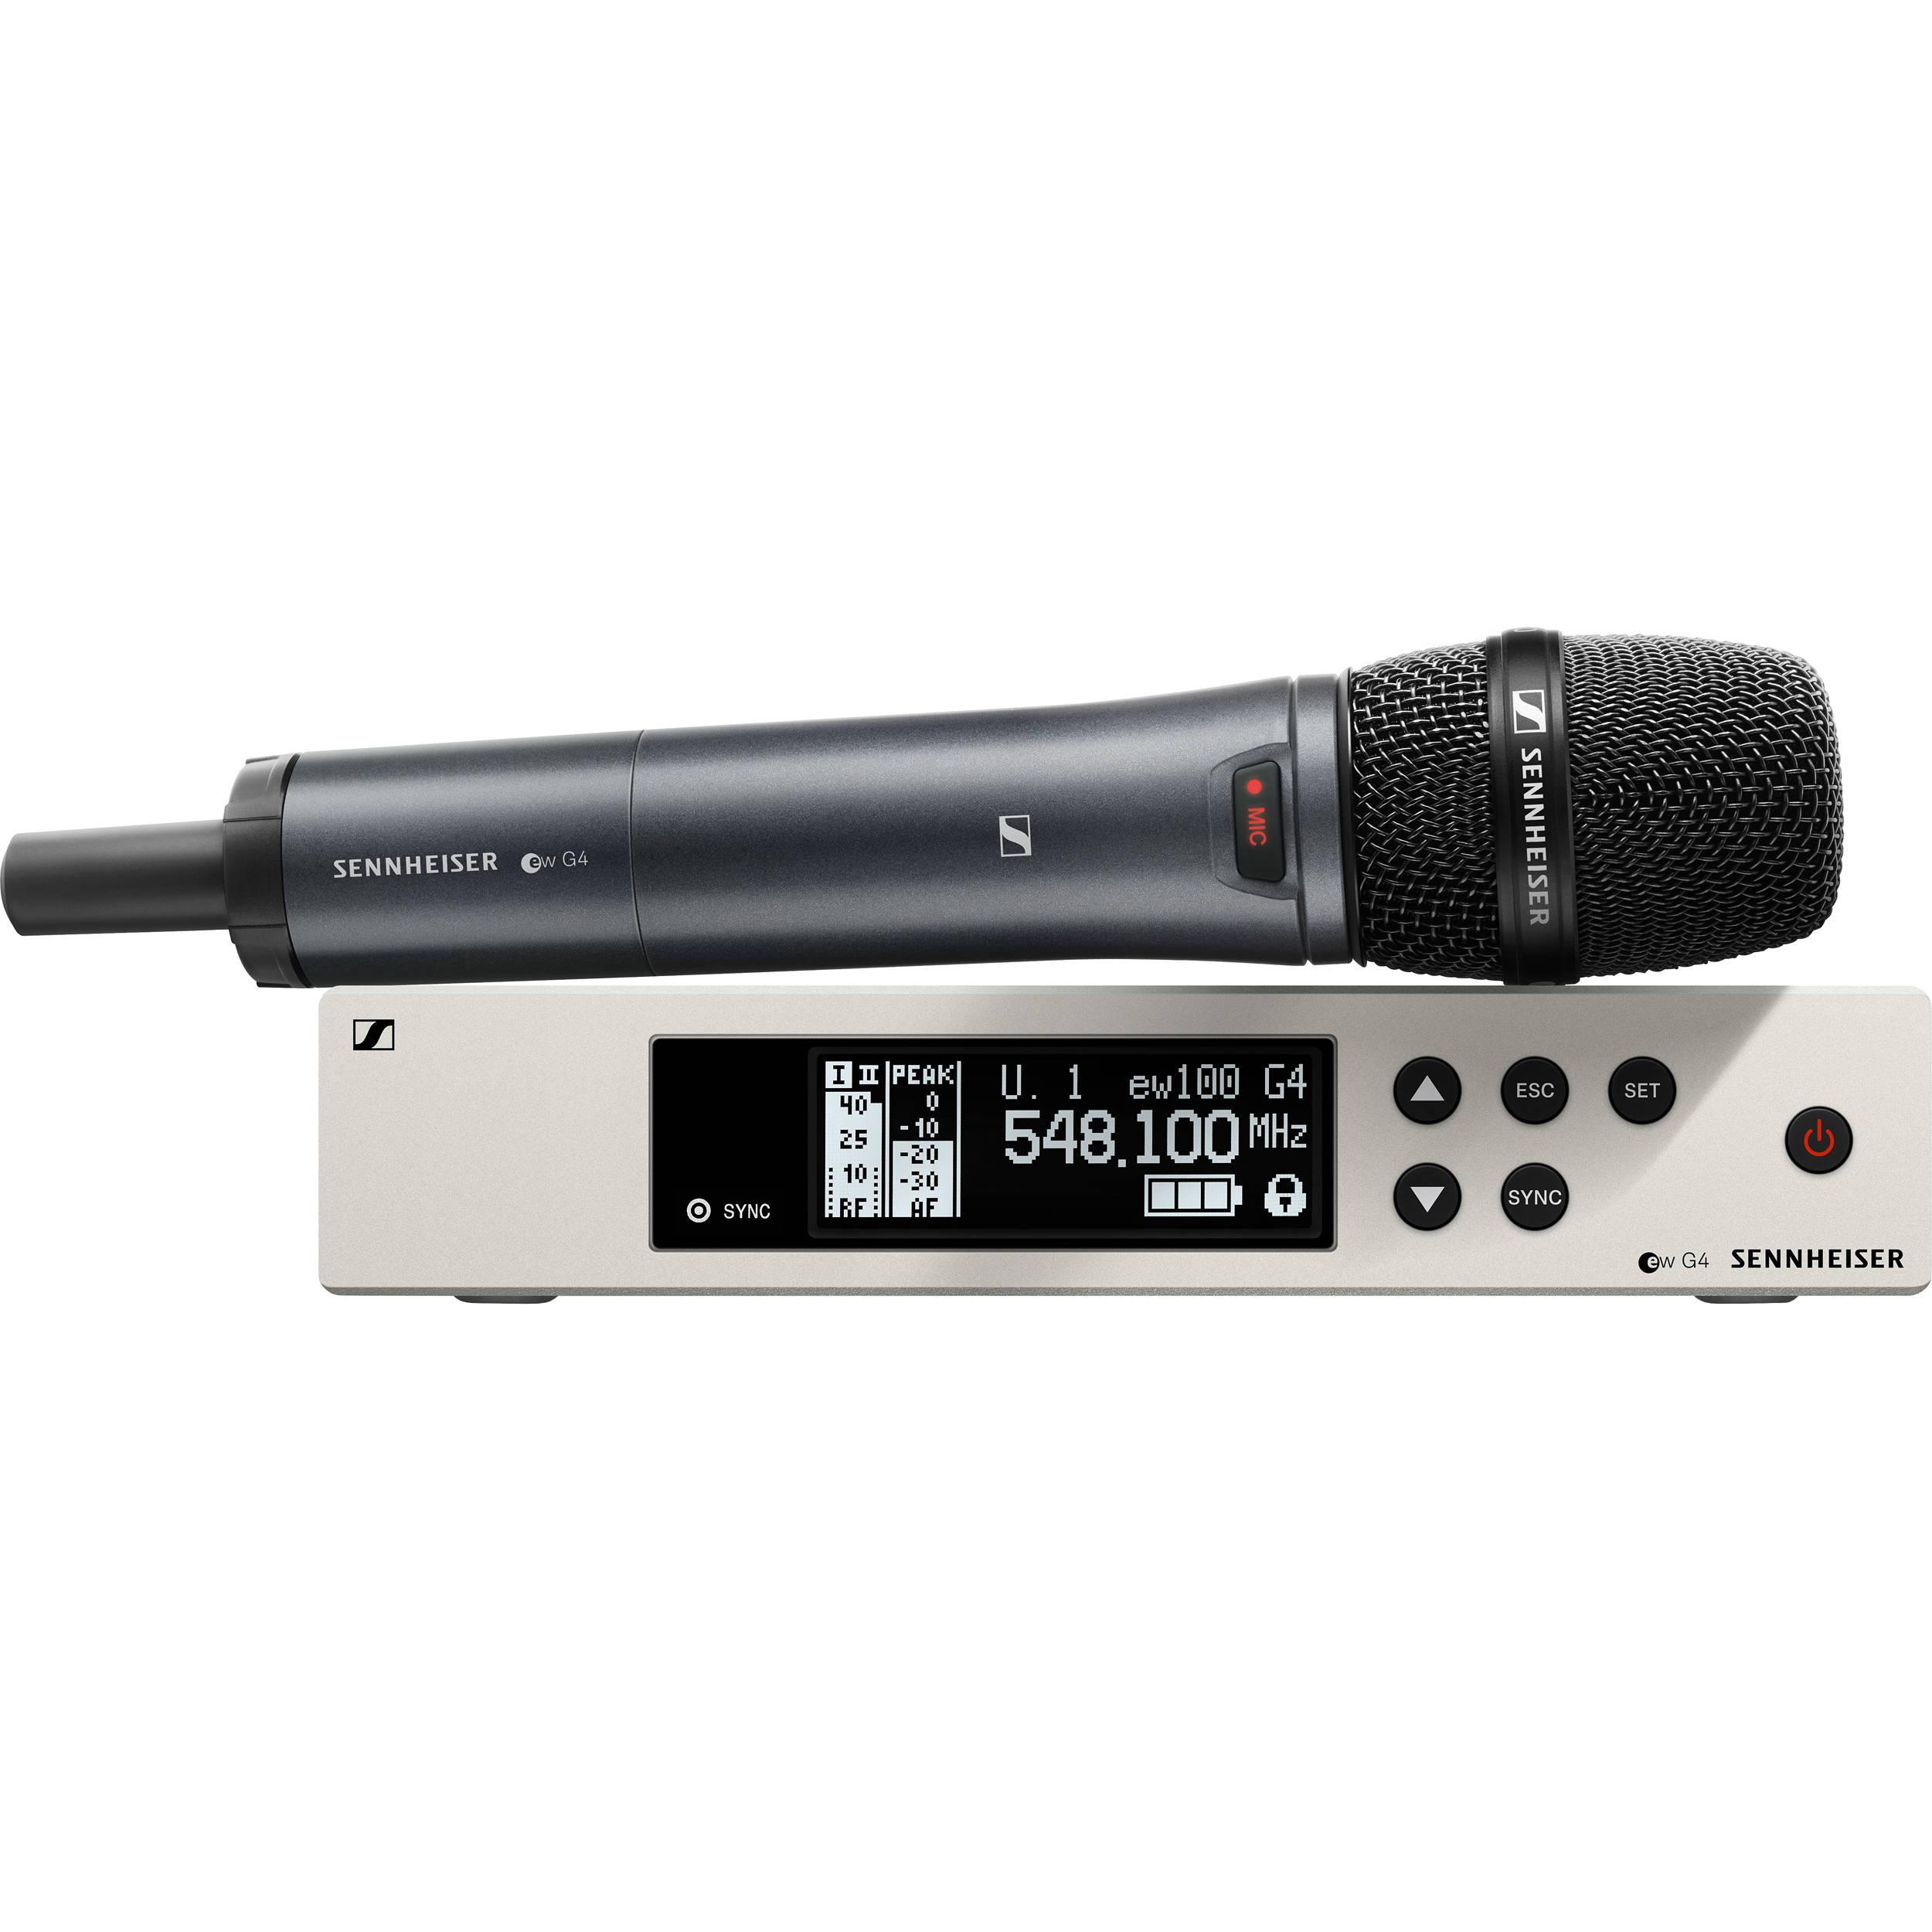 Sennheiser EW 112P G4 – Camera Mount Wireless Microphone